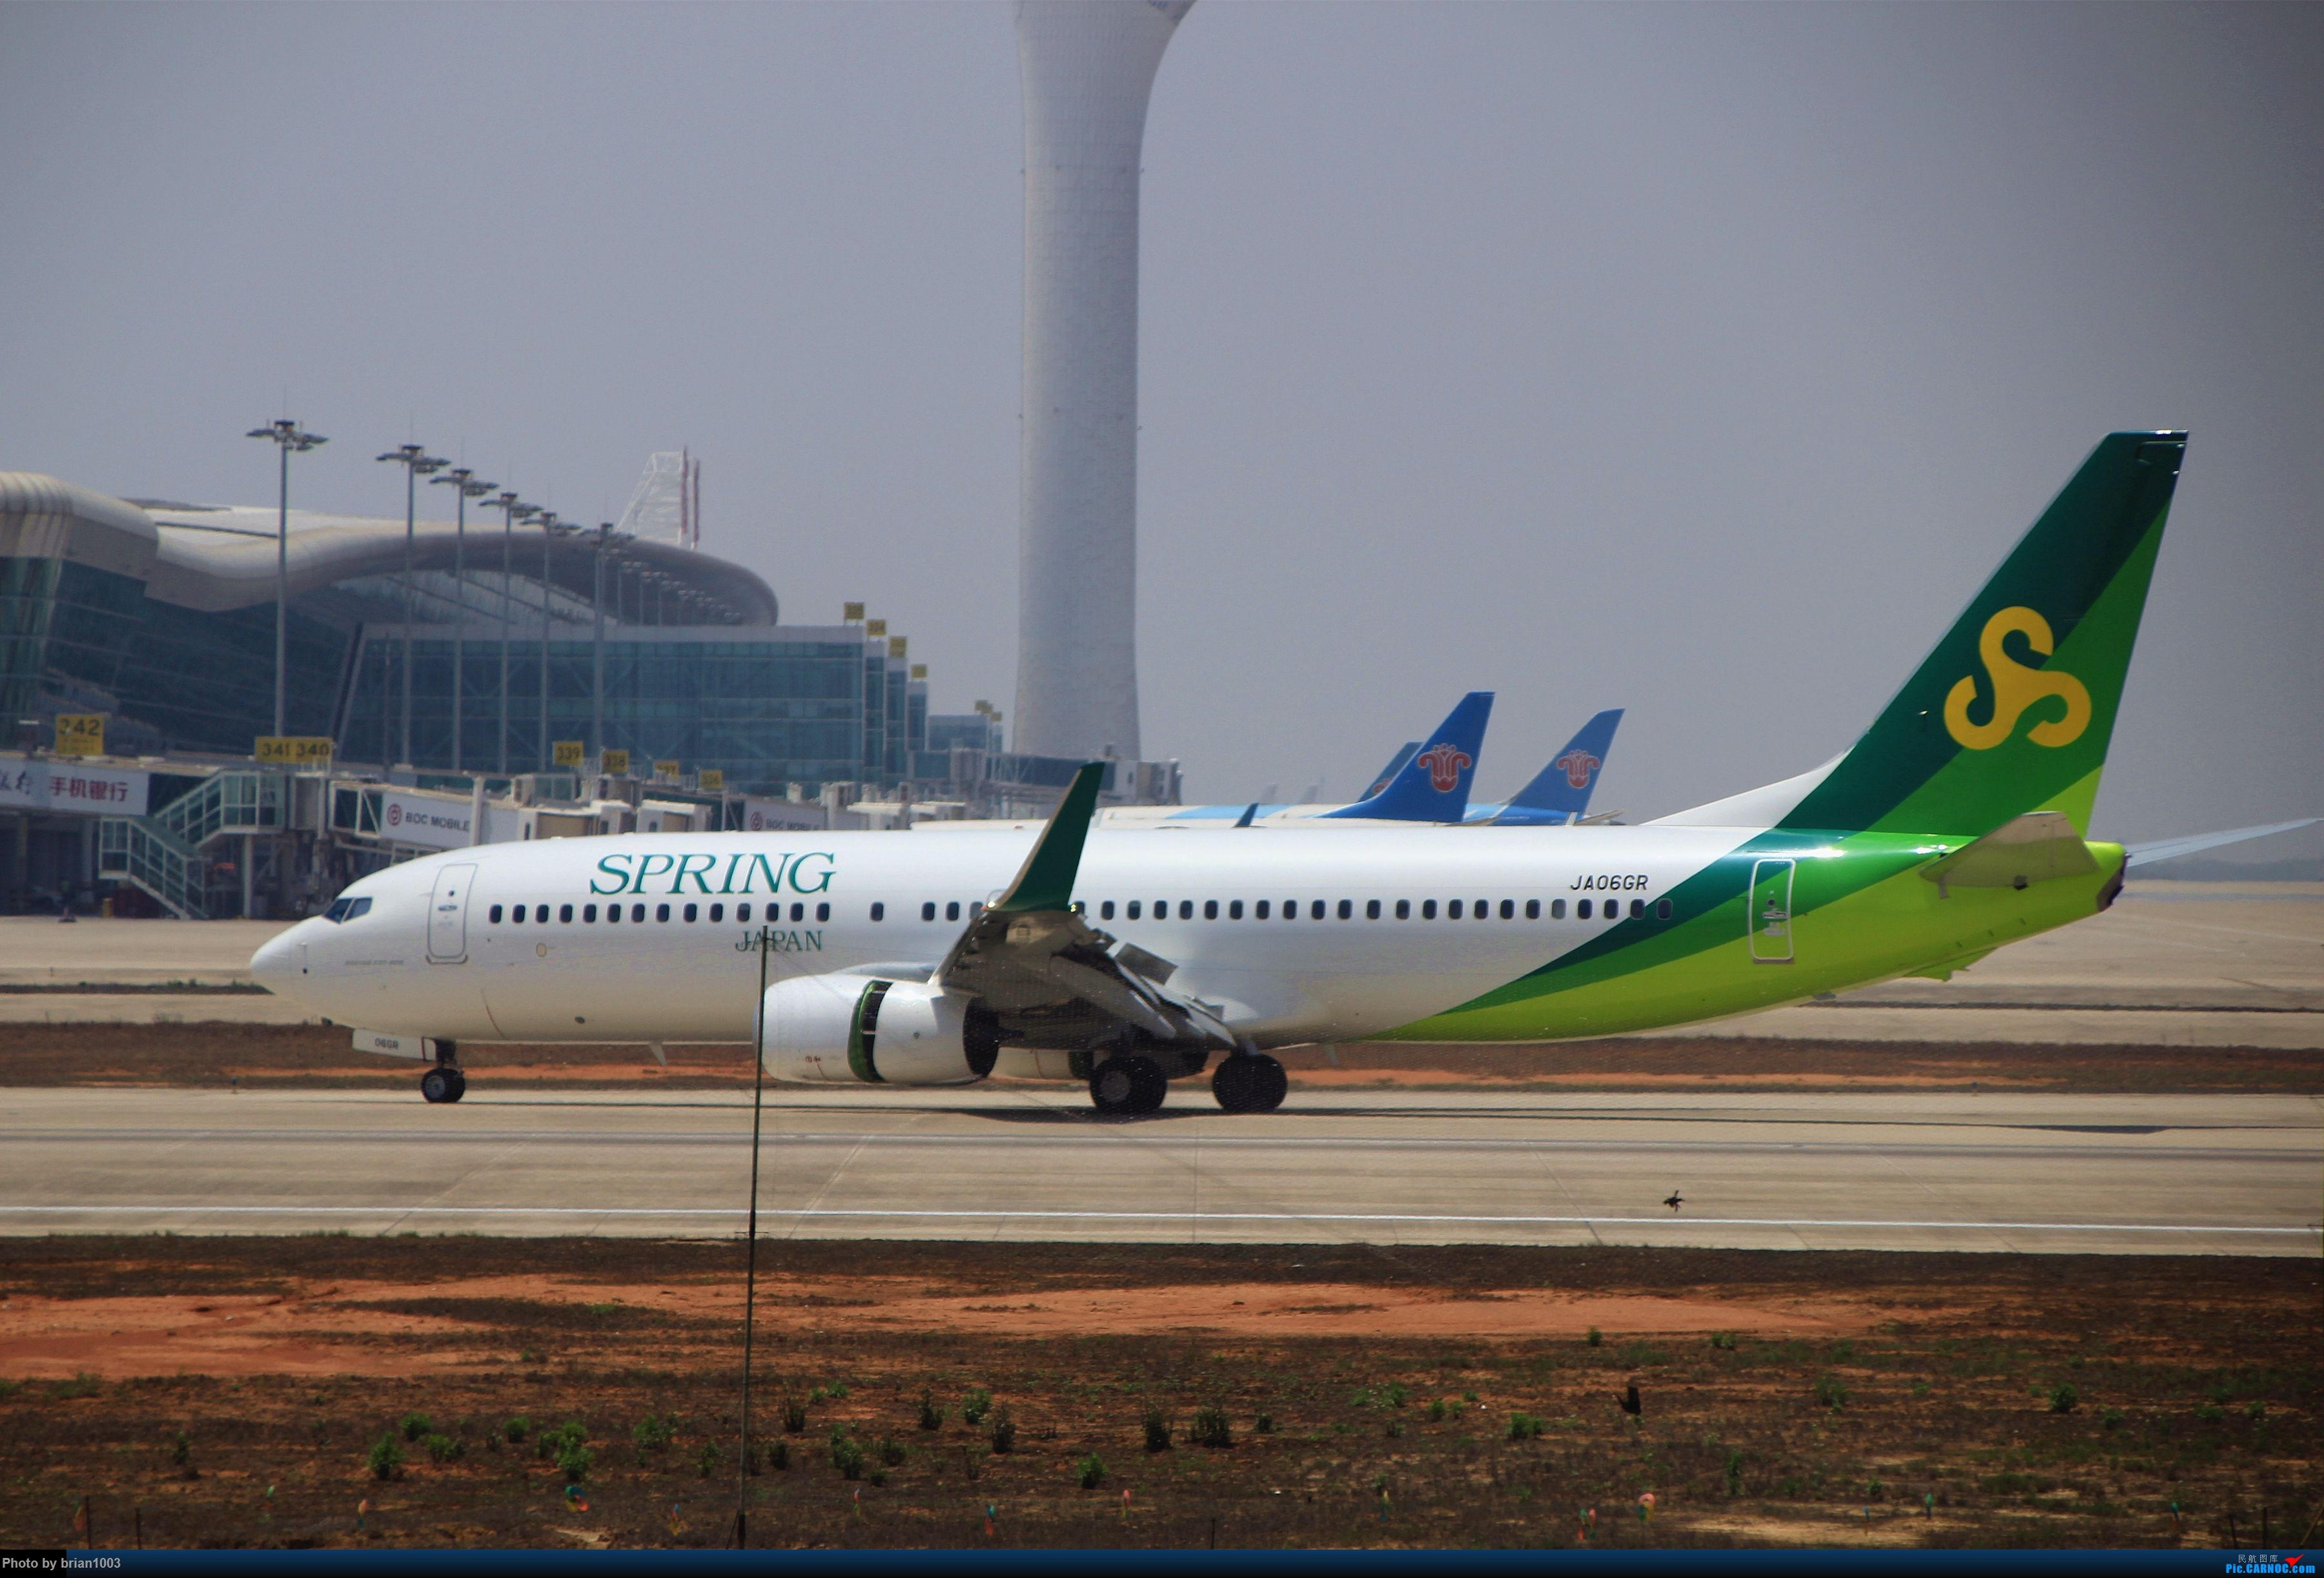 Re:[原创]WUH武汉天河机场拍机之喜迎酷航788和偶遇某其他飞机 BOEING 737-800 JA06GR WUH